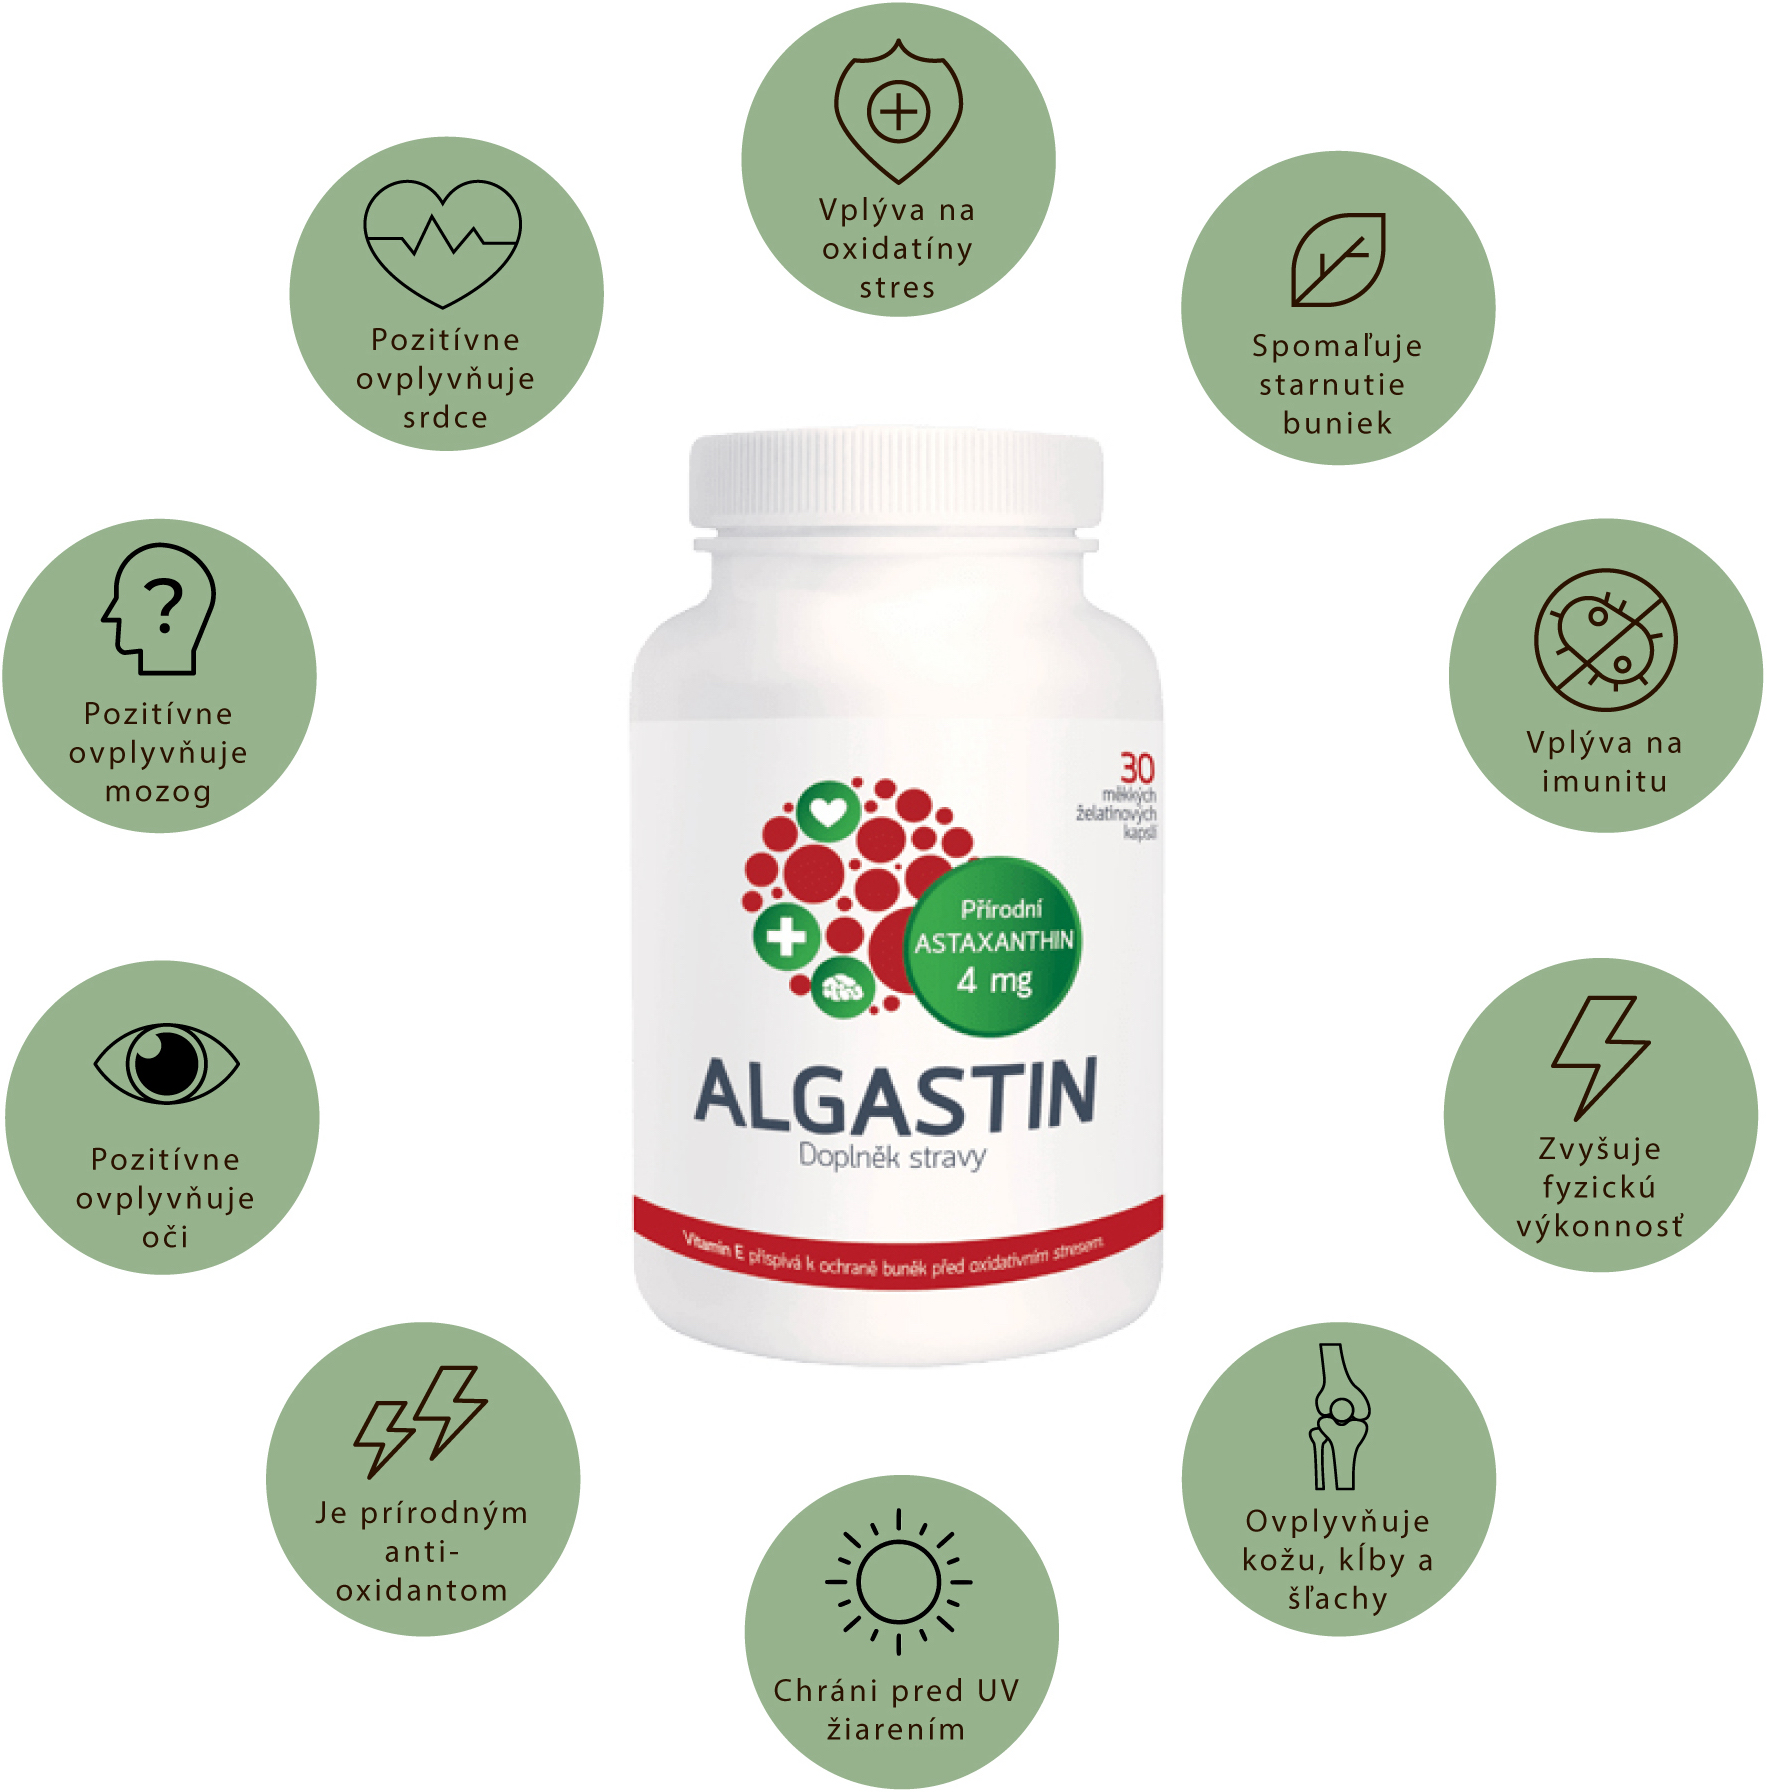 prírodný astaxanthin a jeho účinky